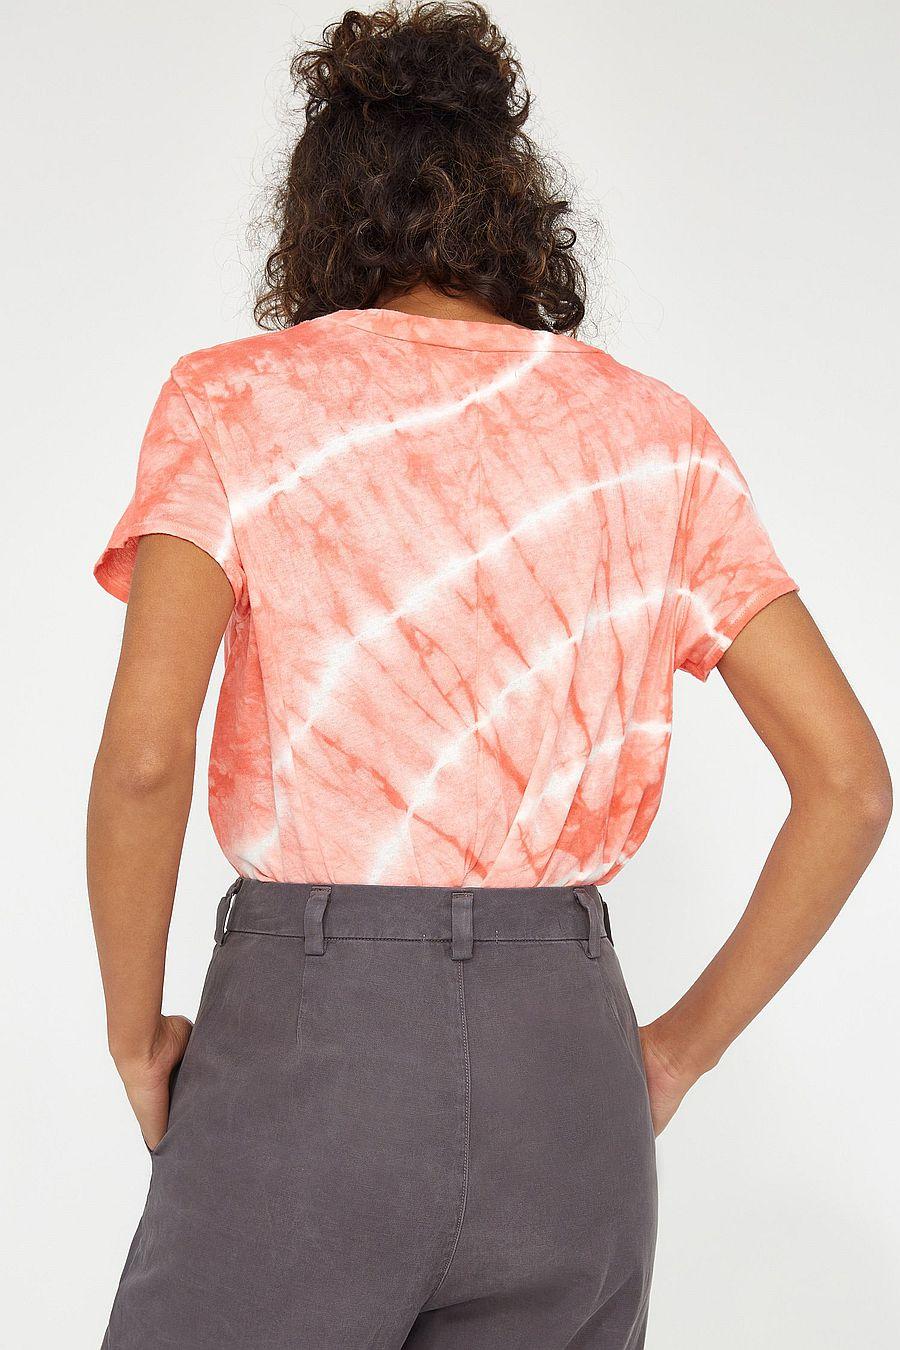 LACAUSA Clothing Frank Tee - Grapefruit